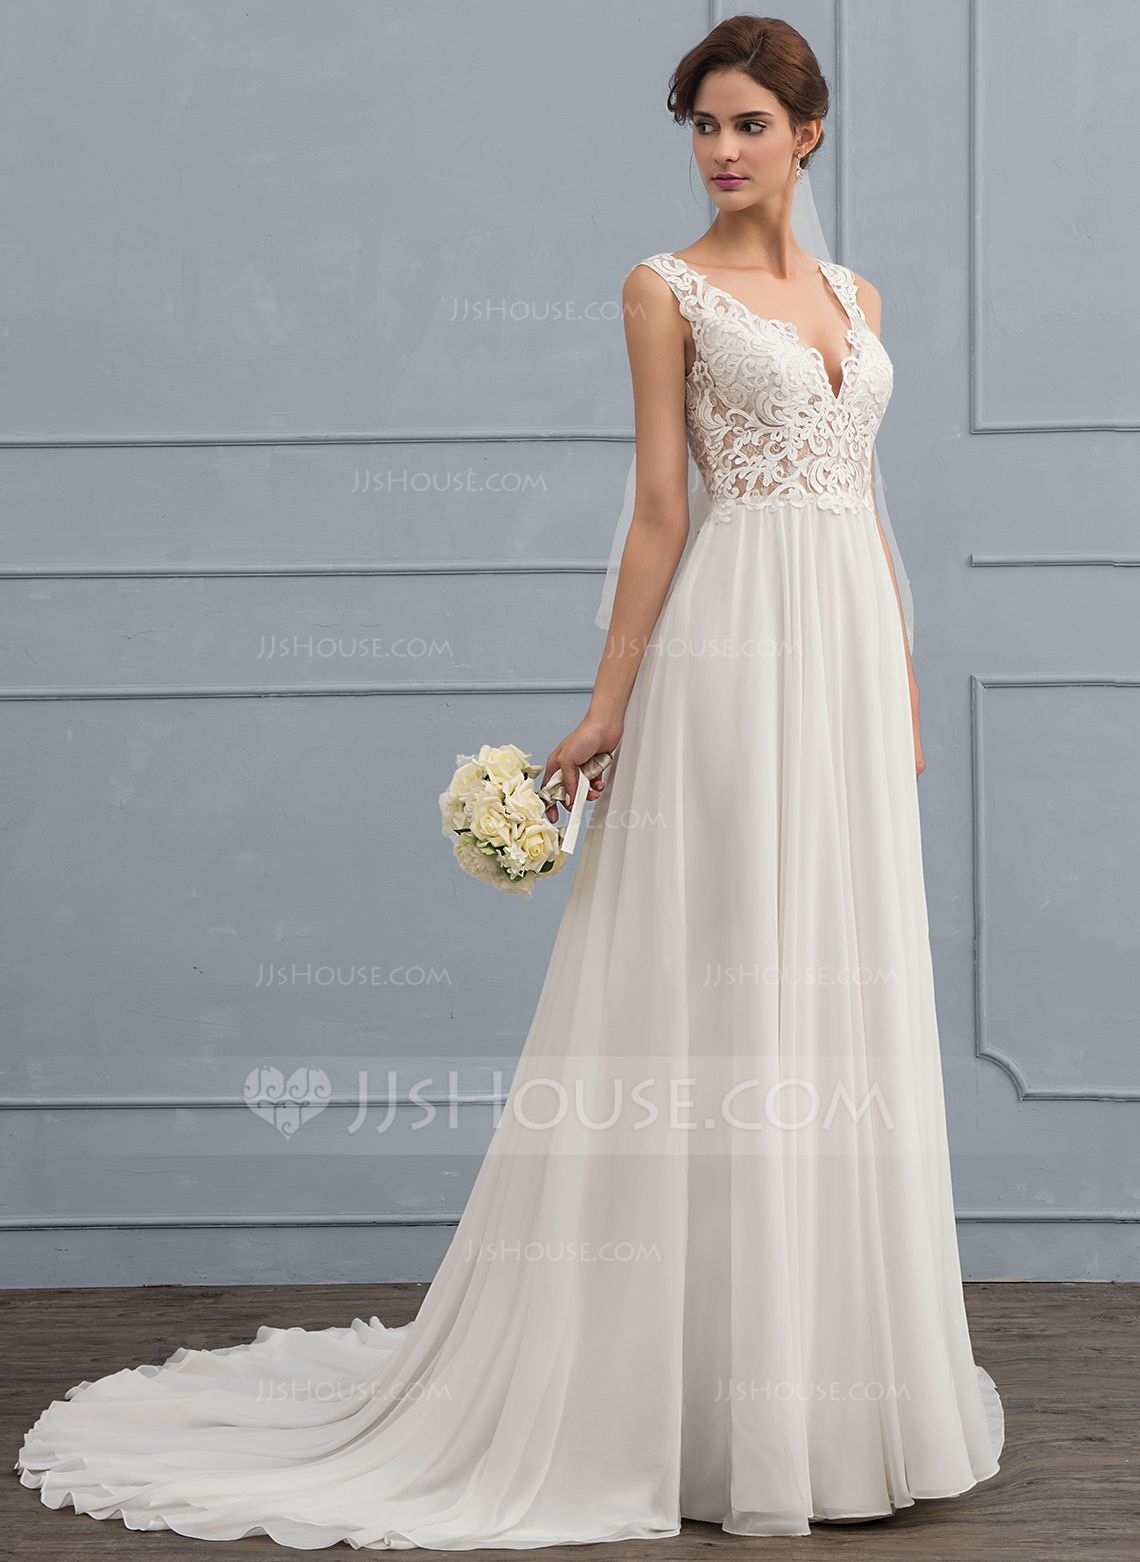 Us 236 00 A Line V Neck Court Train Chiffon Wedding Dress Jj S House Online Wedding Dress Wedding Dresses Chiffon Wedding Dress [ 1562 x 1140 Pixel ]